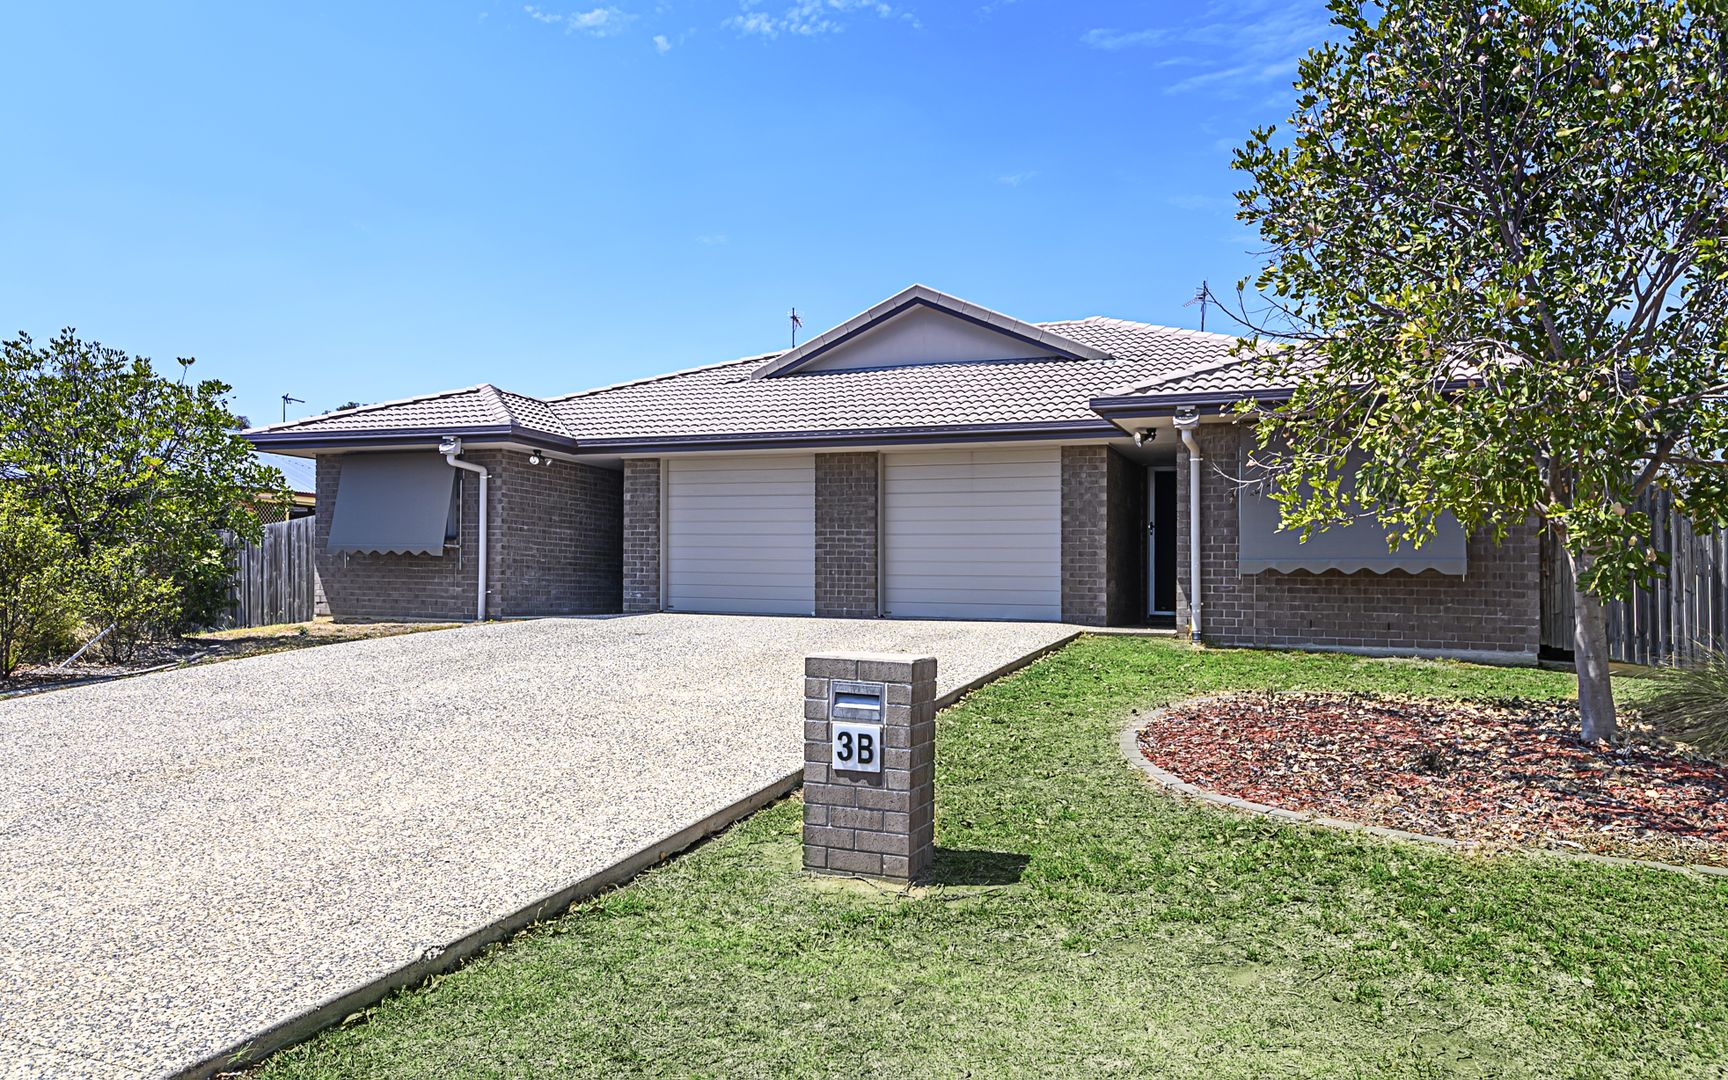 B/3 Pristine Court, Warwick QLD 4370, Image 0